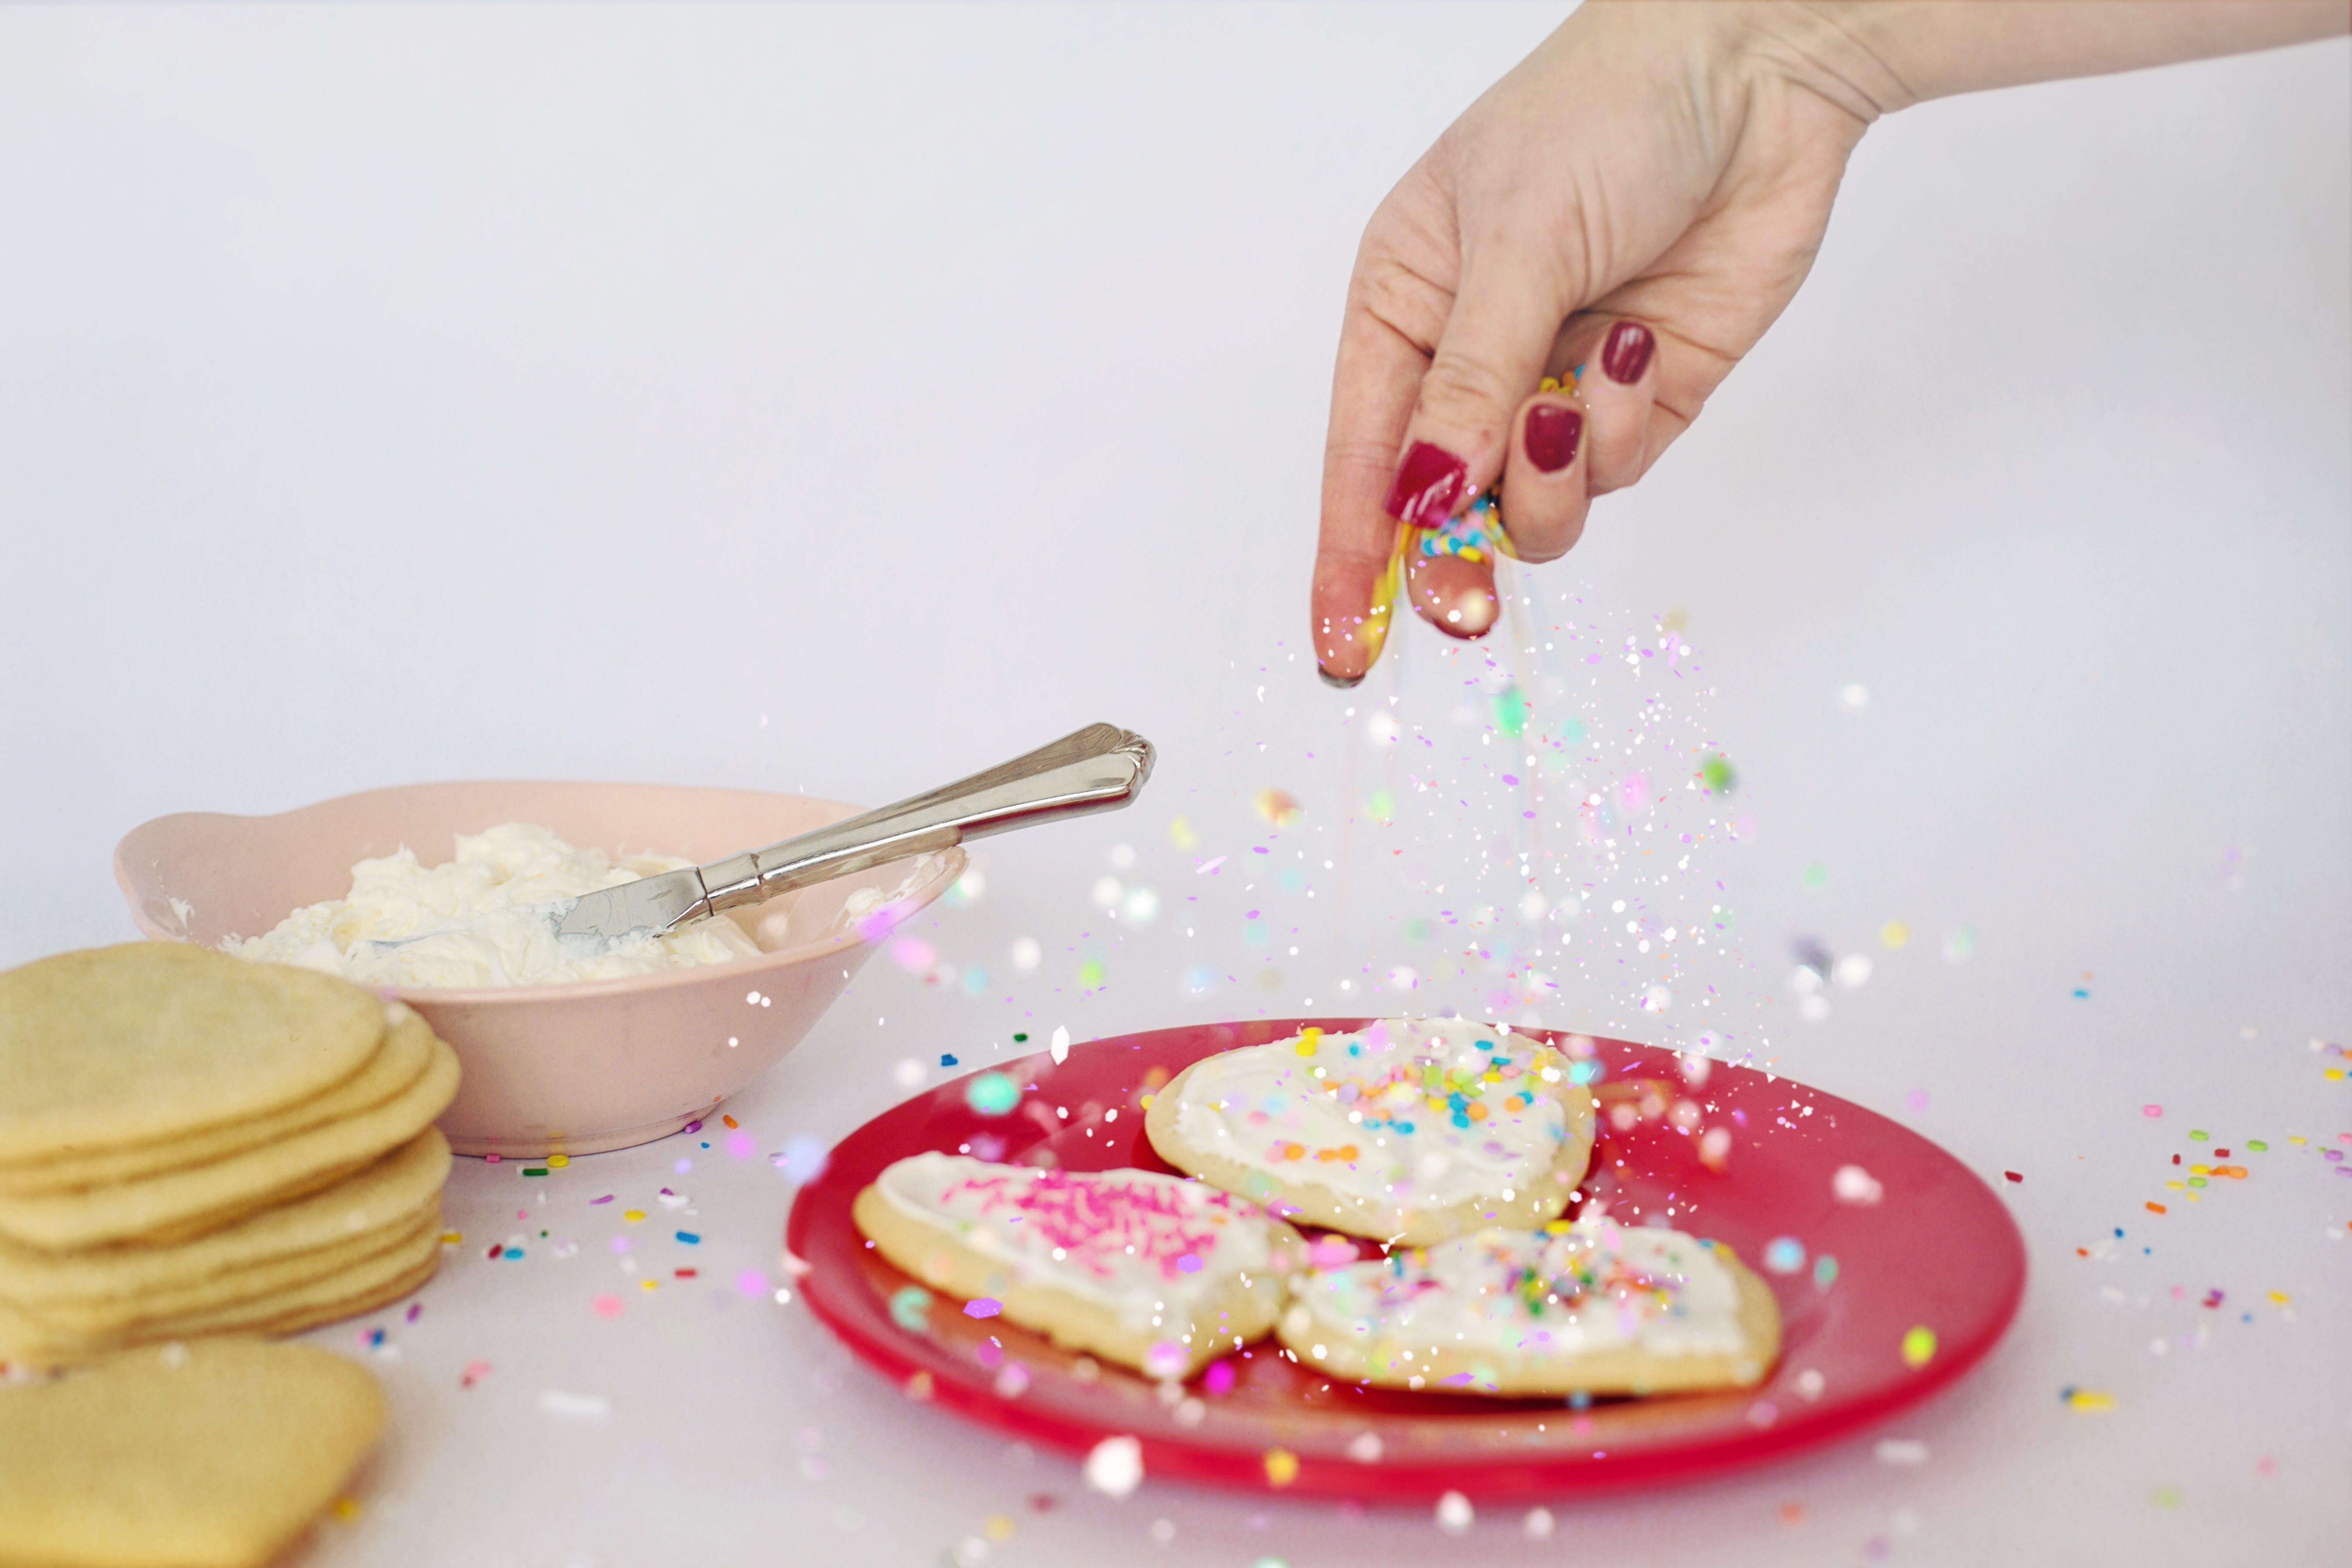 Free stock photo of food, valentine's day, bakery, dessert